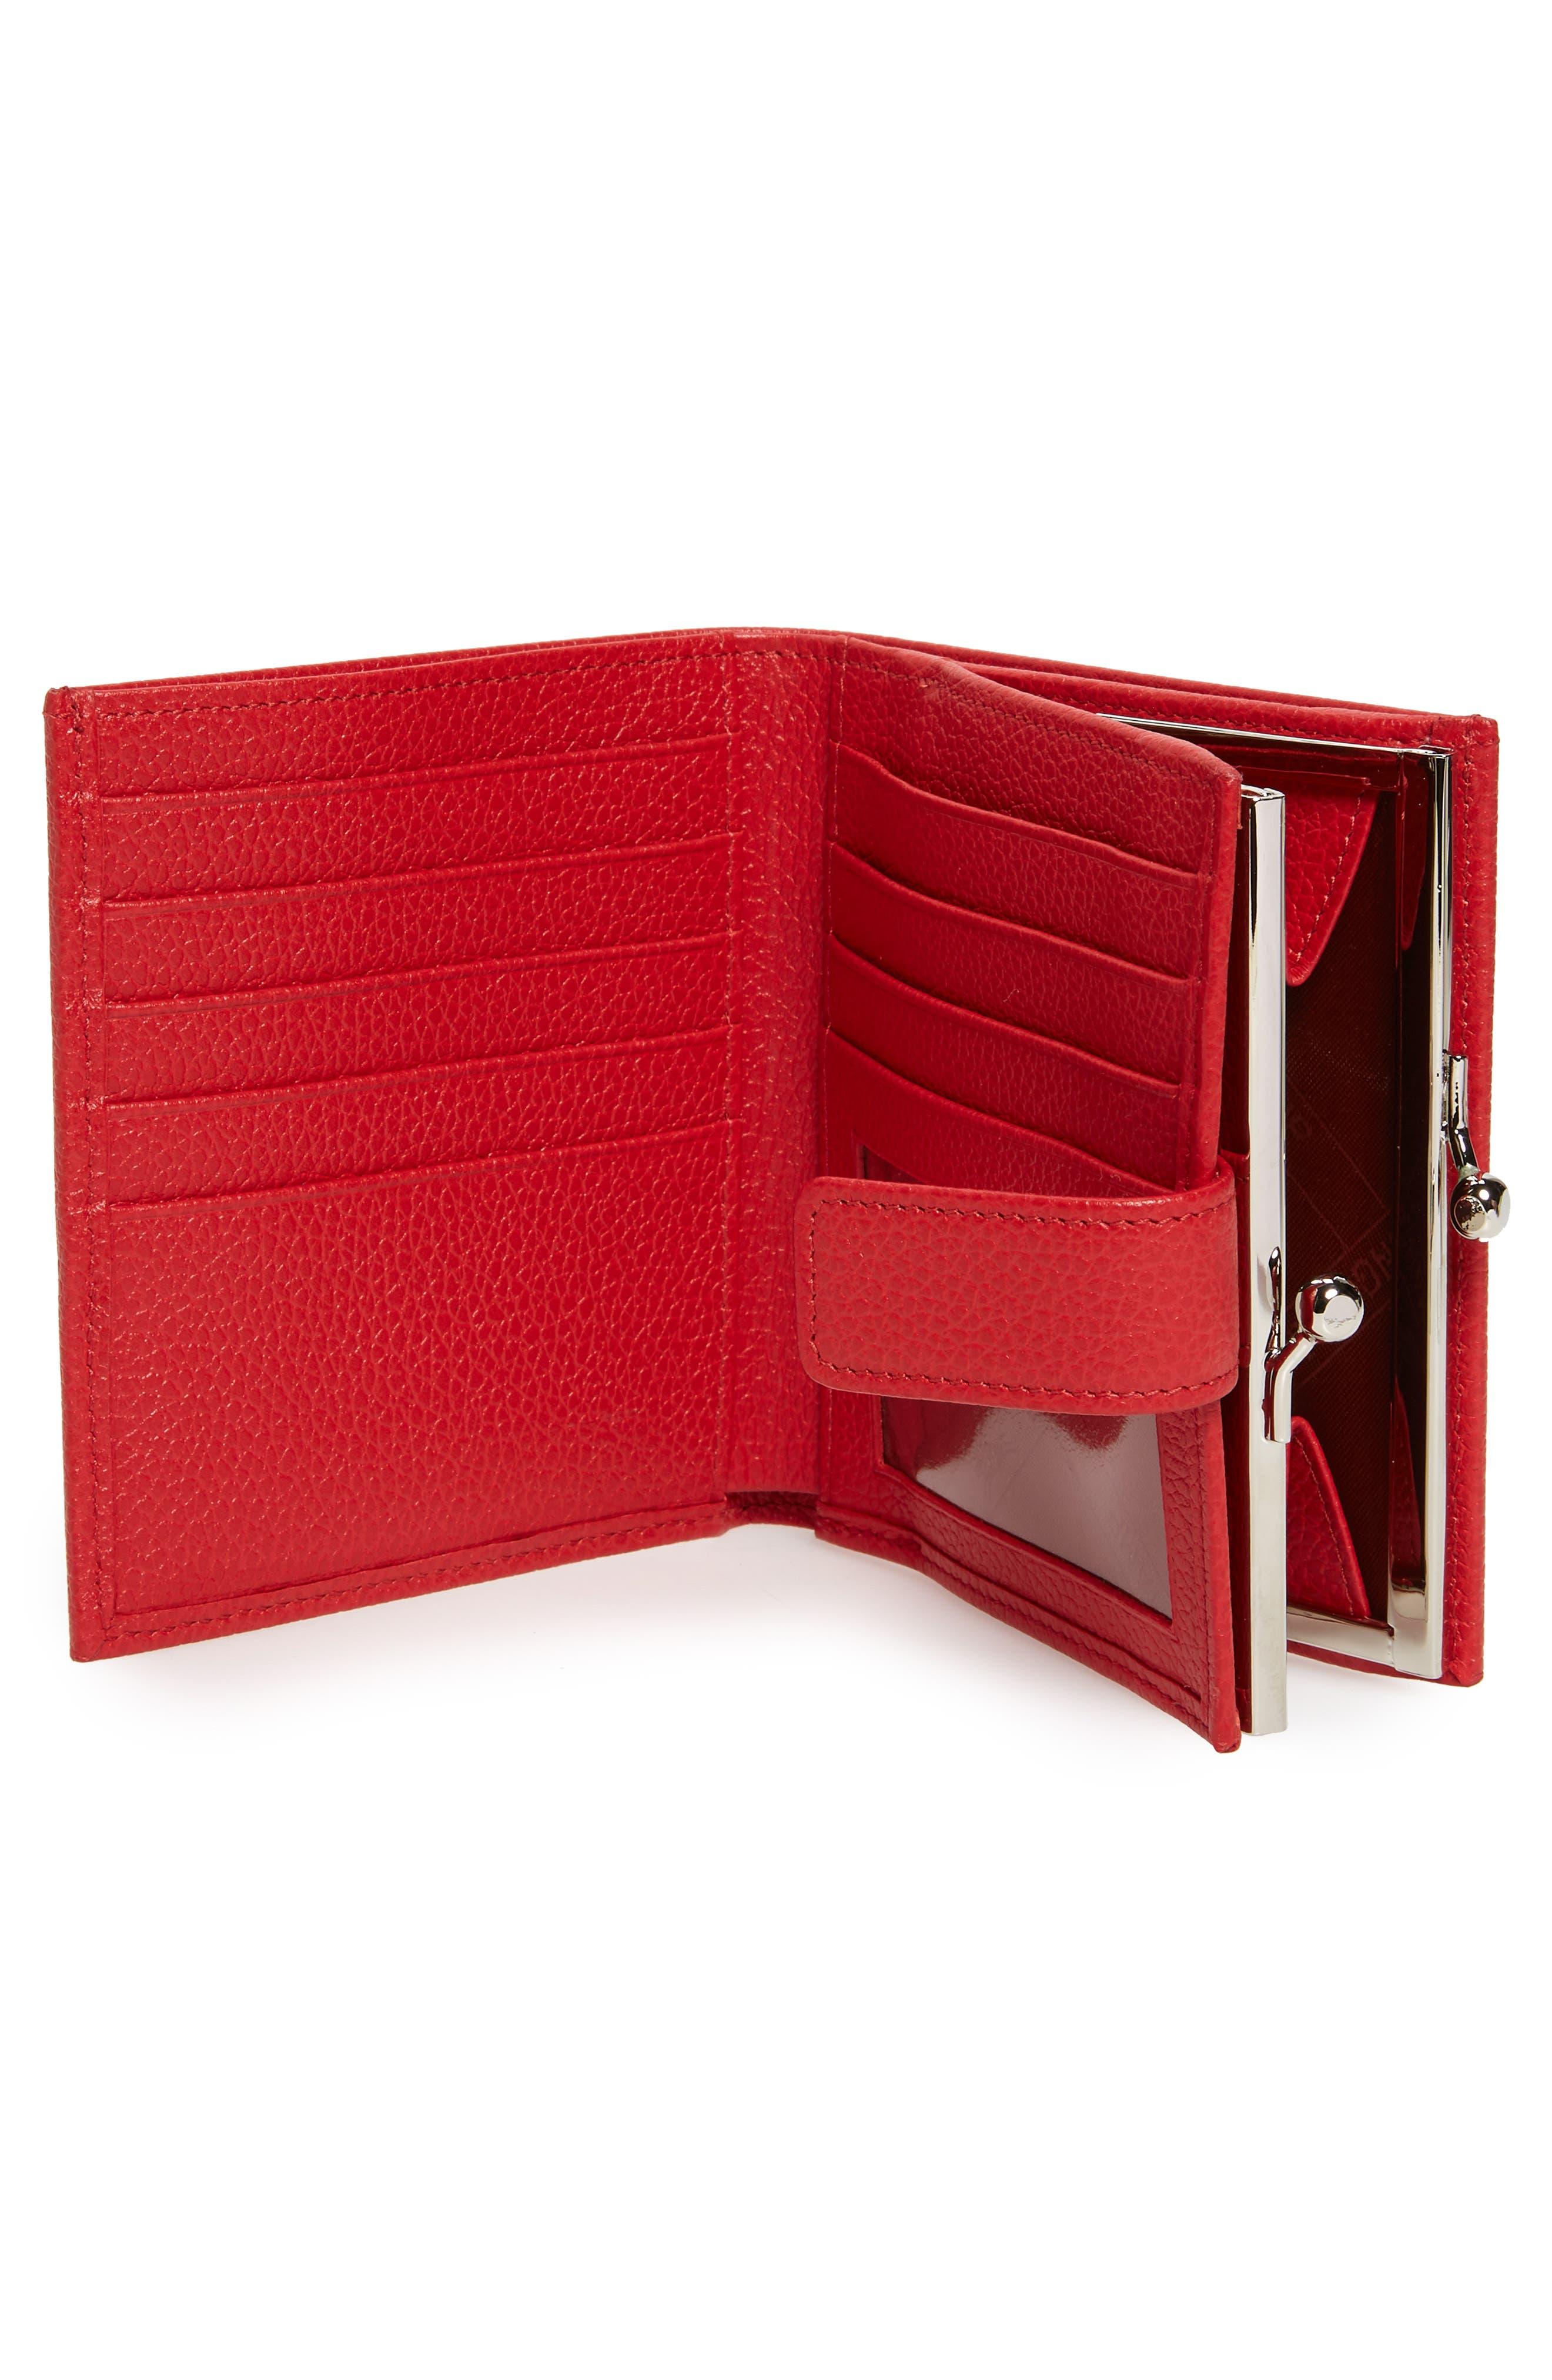 LONGCHAMP, 'Le Foulonne' Pebbled Leather Wallet, Alternate thumbnail 2, color, RED ORANGE